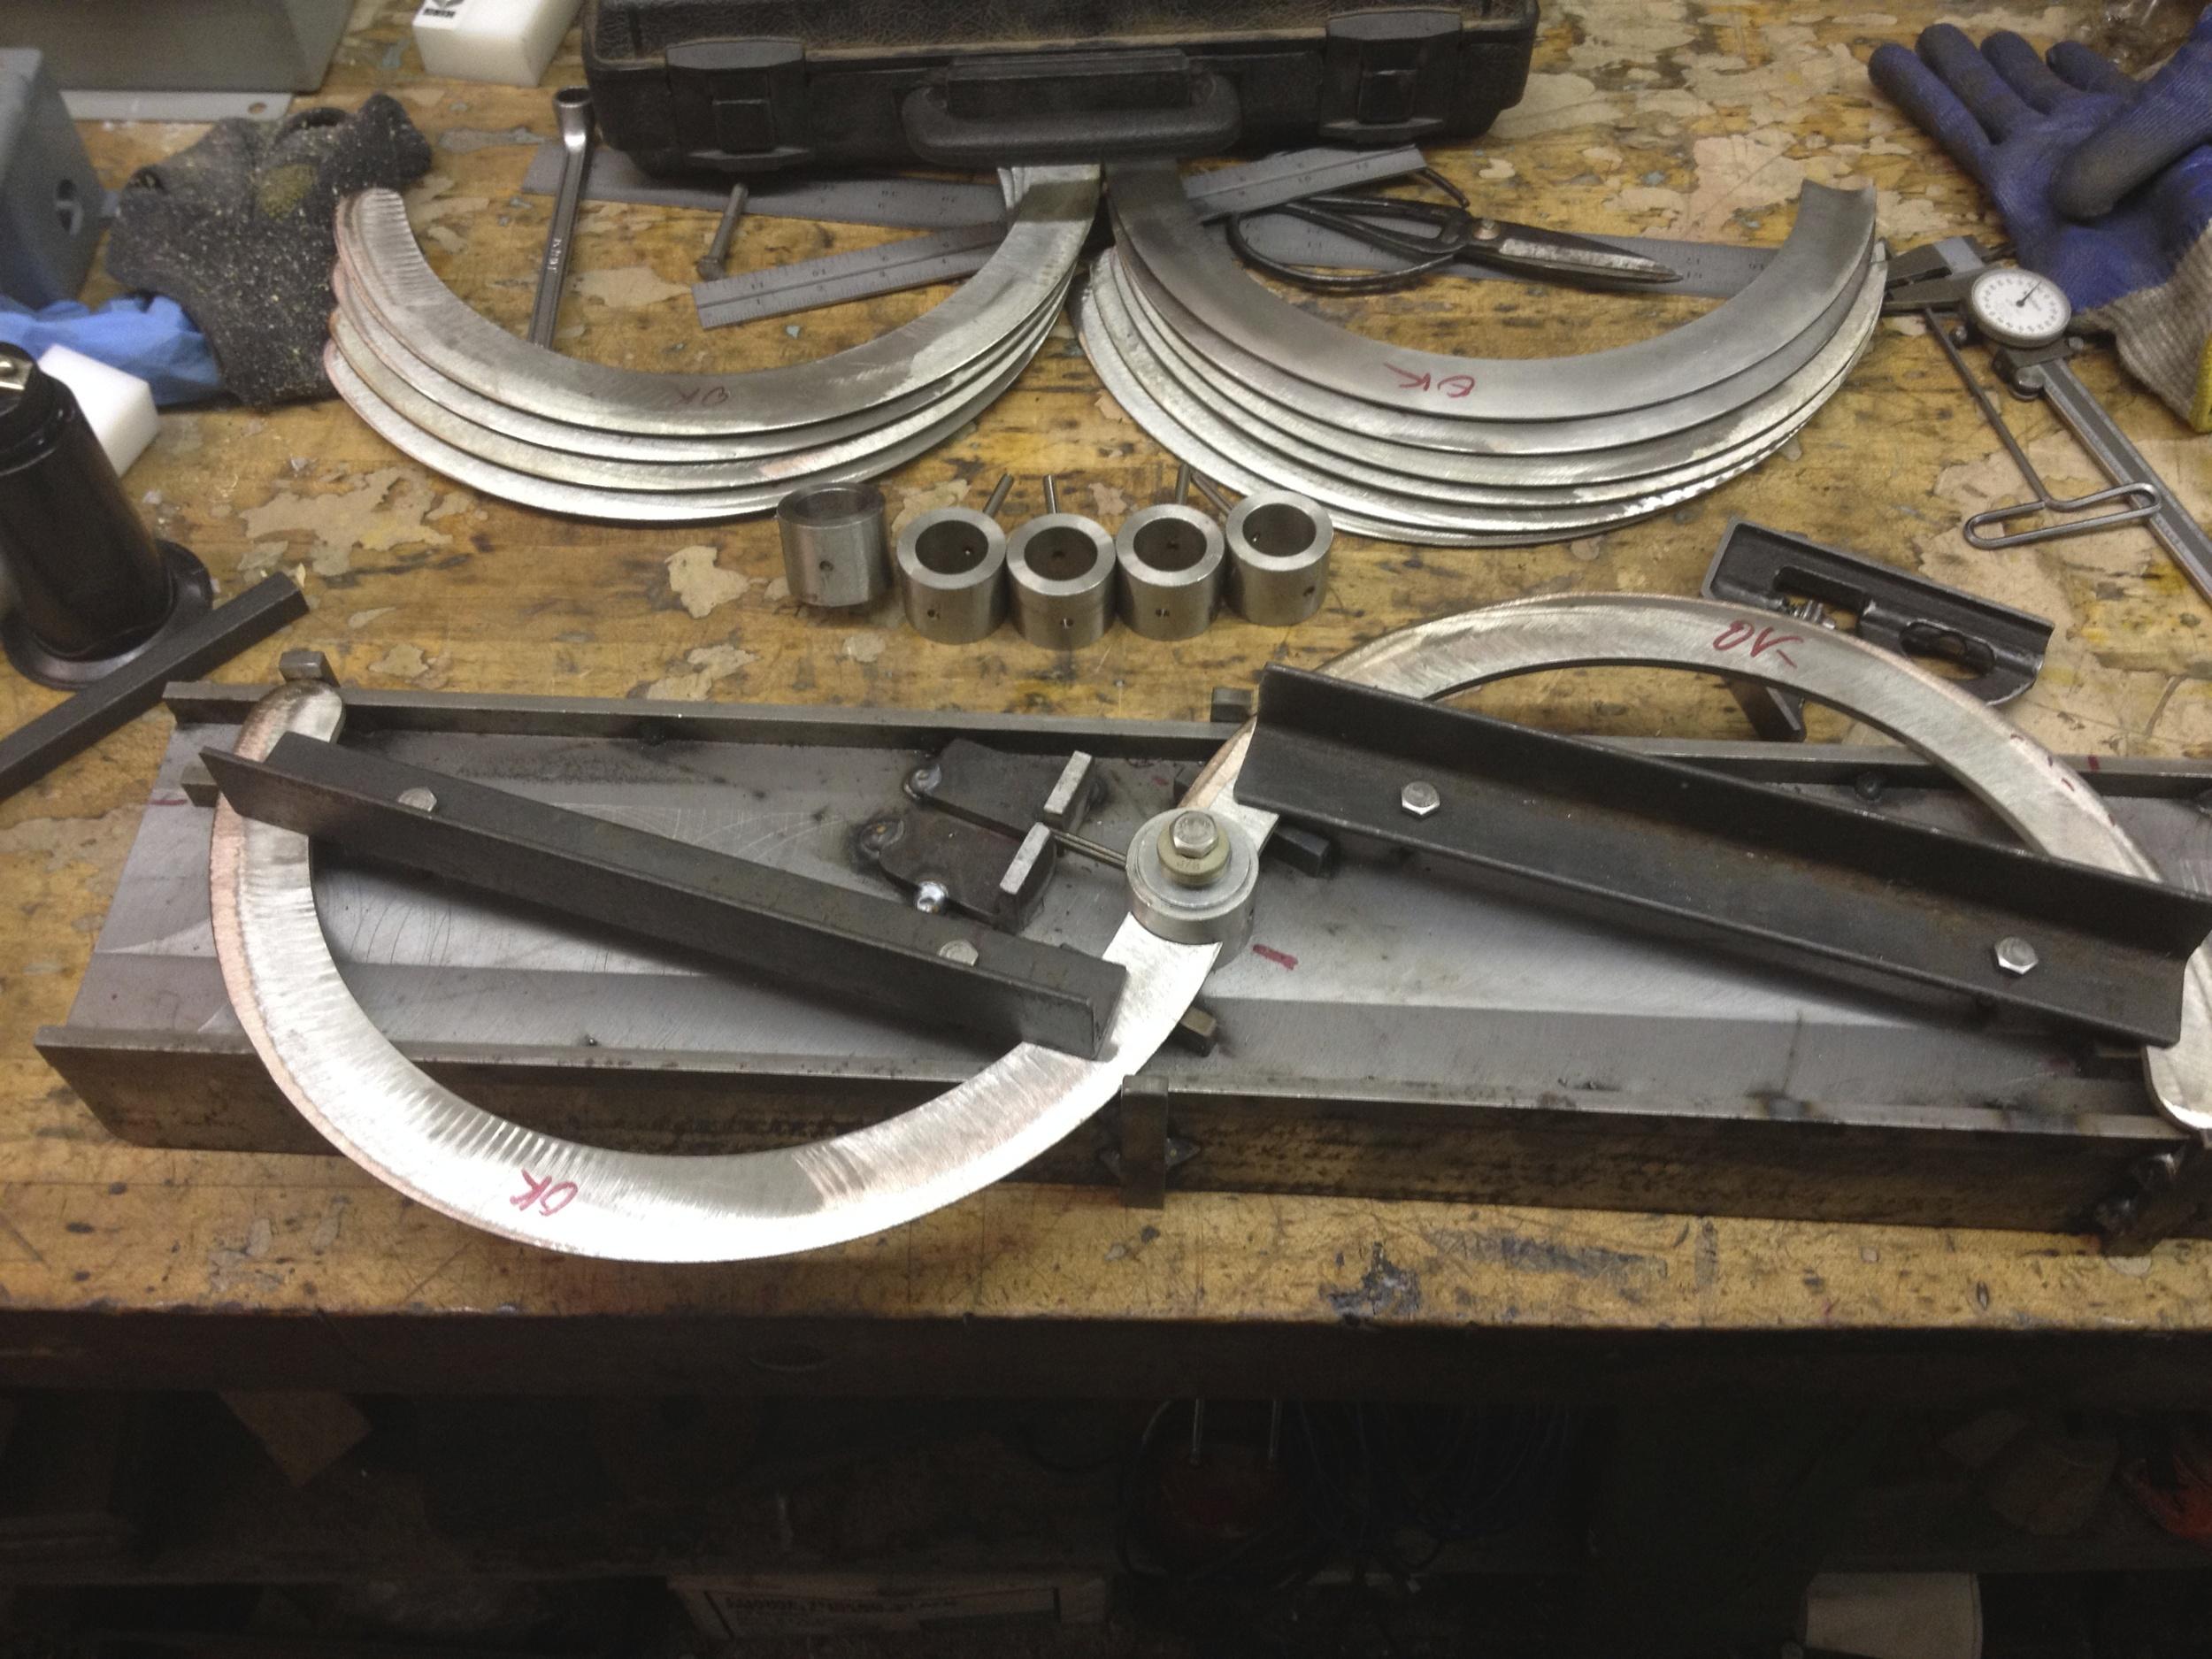 Fabricating Naginata beater blades